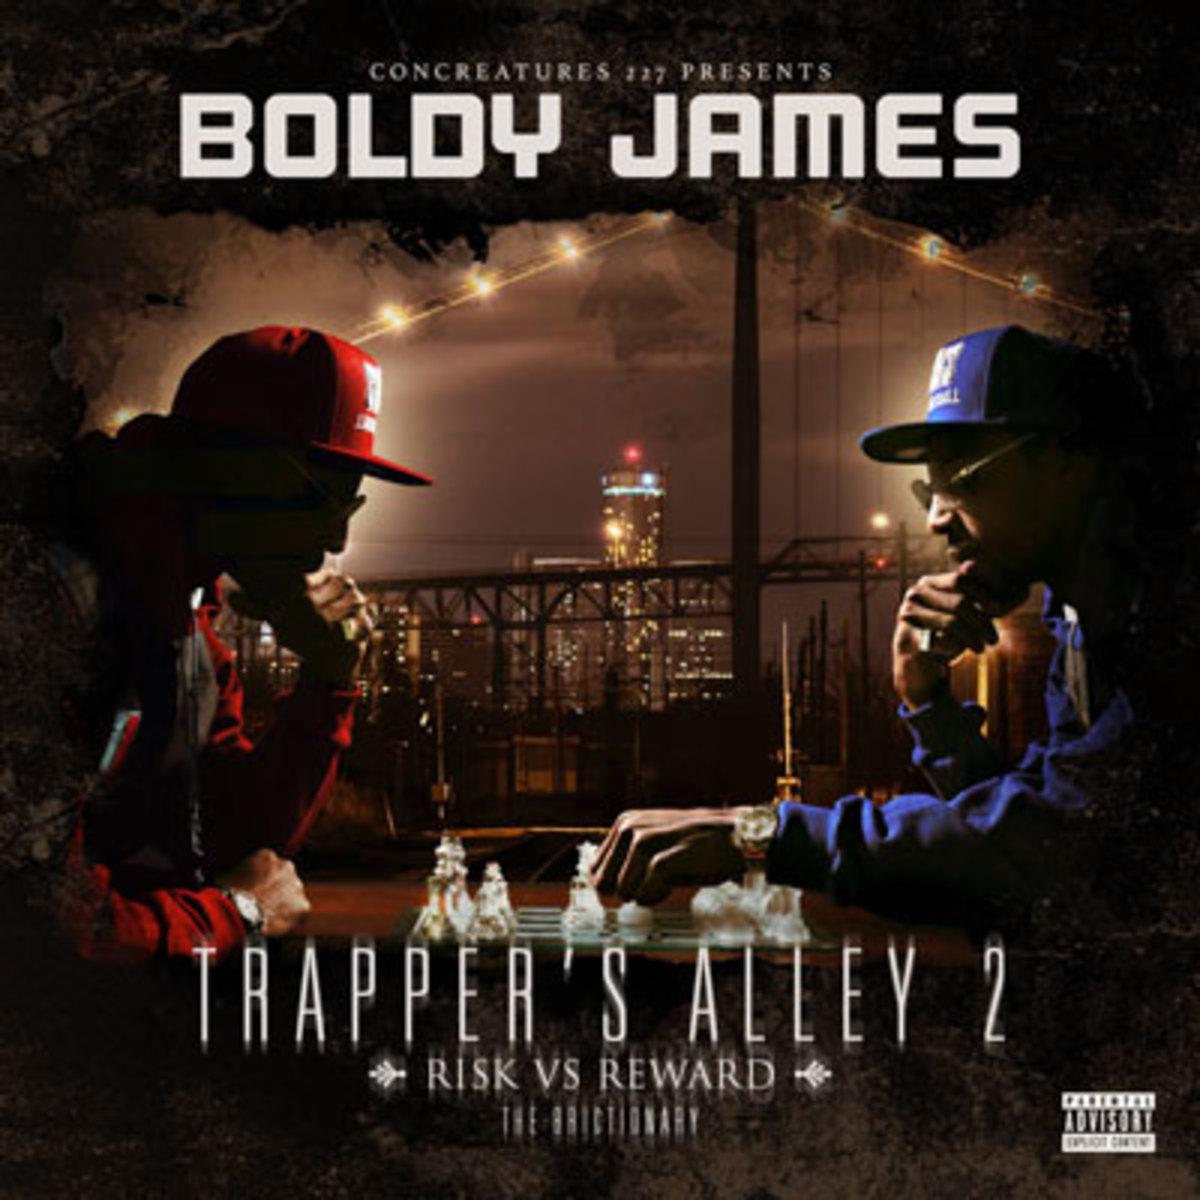 boldyjames-trappersalley2.jpg